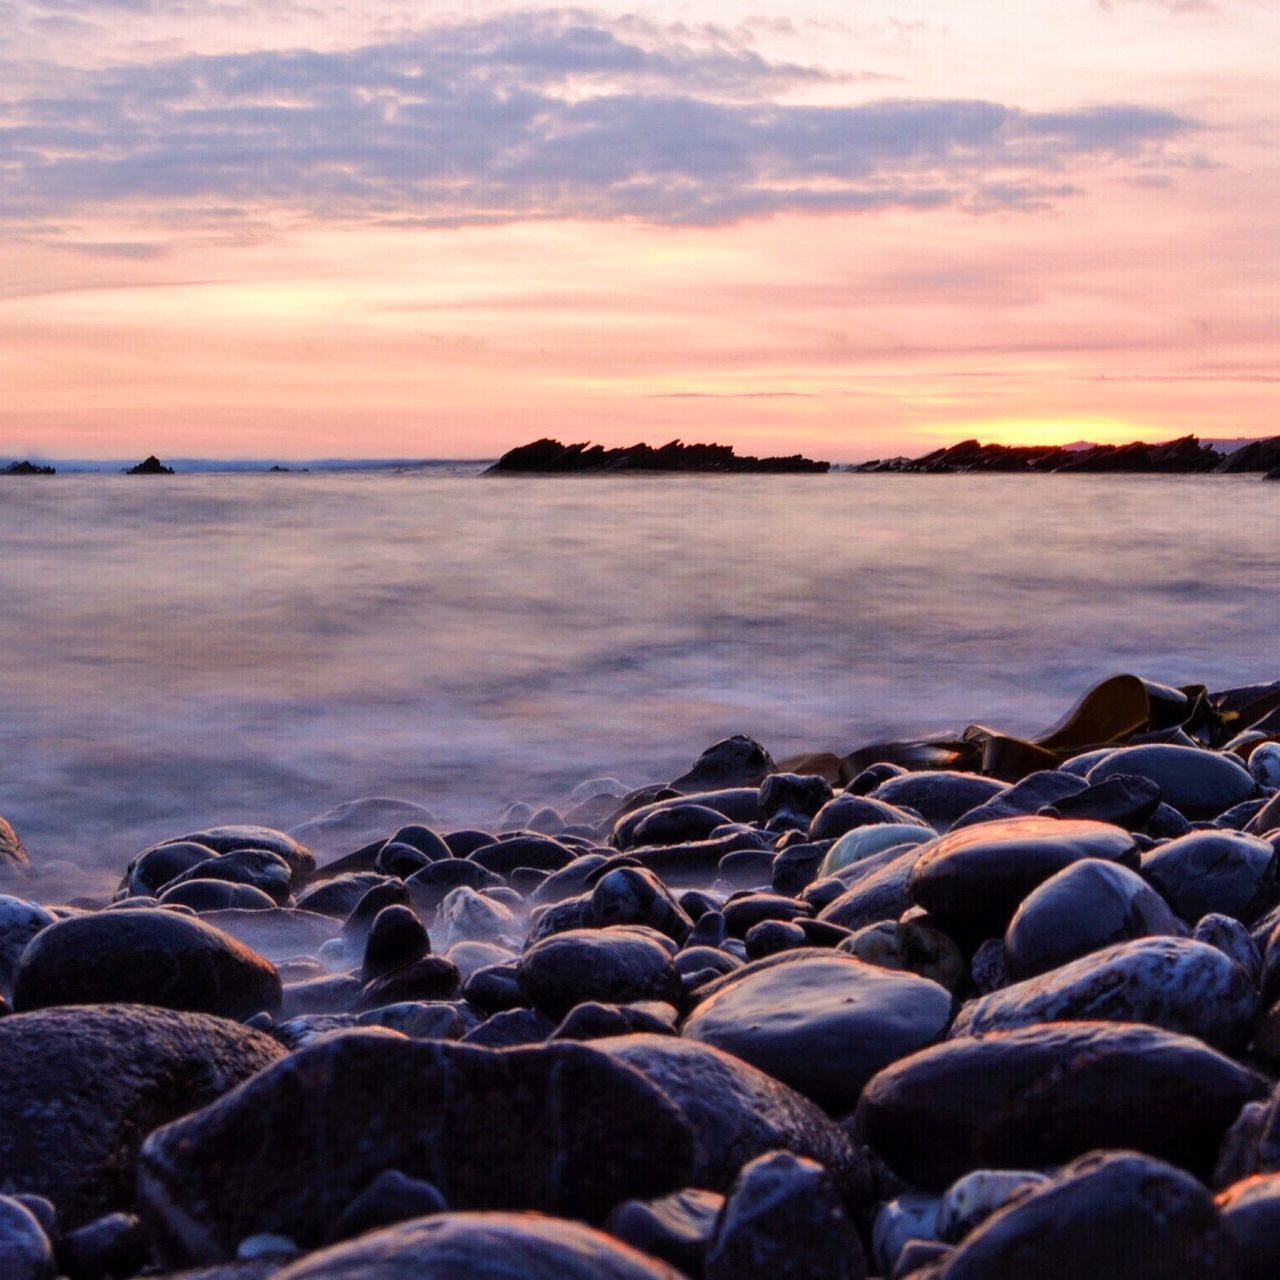 Sunset Water Scenics Tranquil Scene Sea Beauty In Nature Tranquility Idyllic Beach Shore Rock - Object Nature Remote Cloud - Sky Cloud Sky Ocean Non-urban Scene Calm